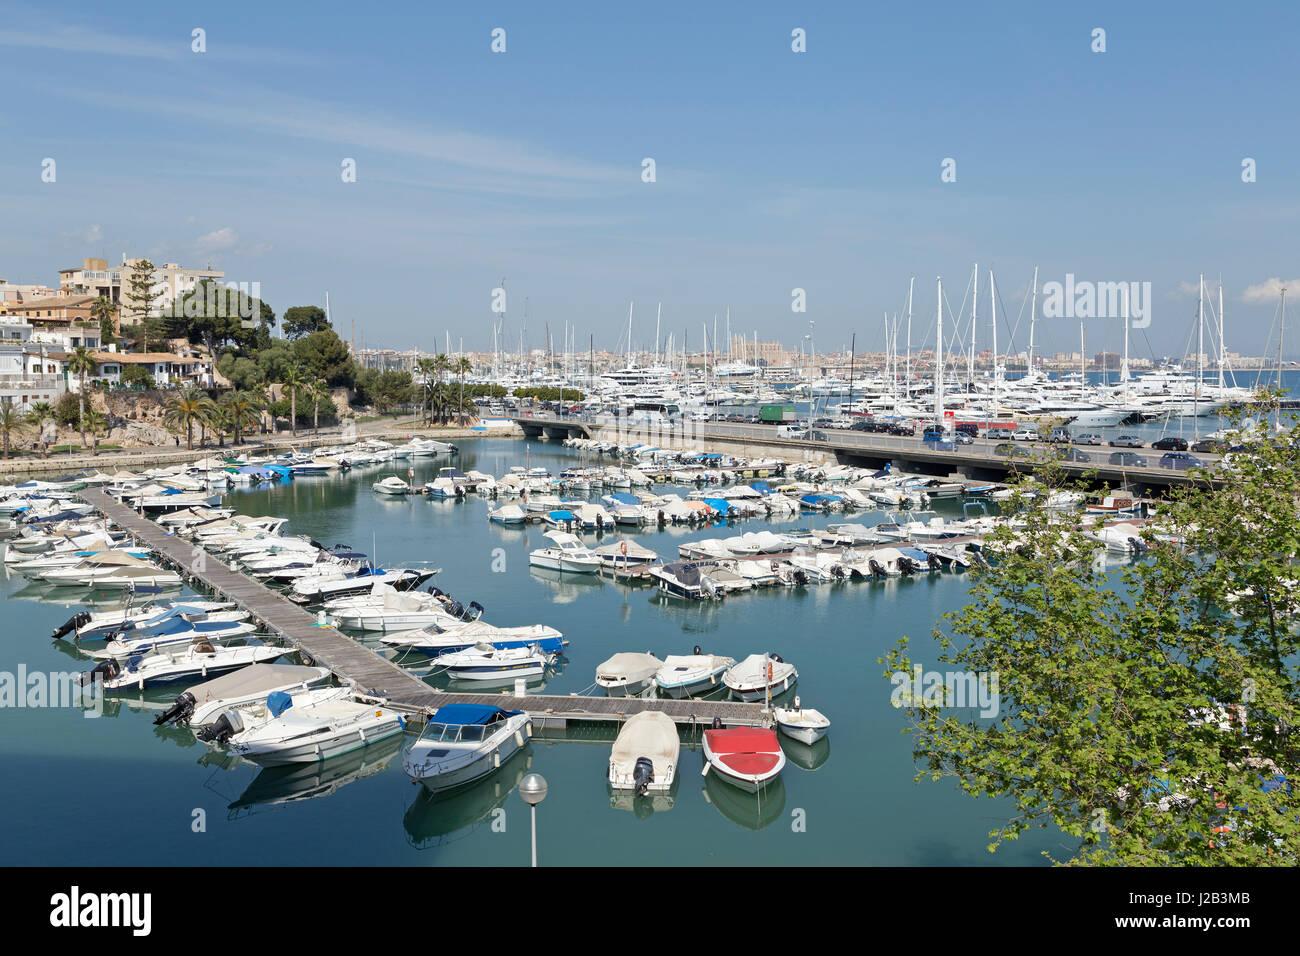 Yachthafen in Palma De Mallorca, Spanien Stockbild